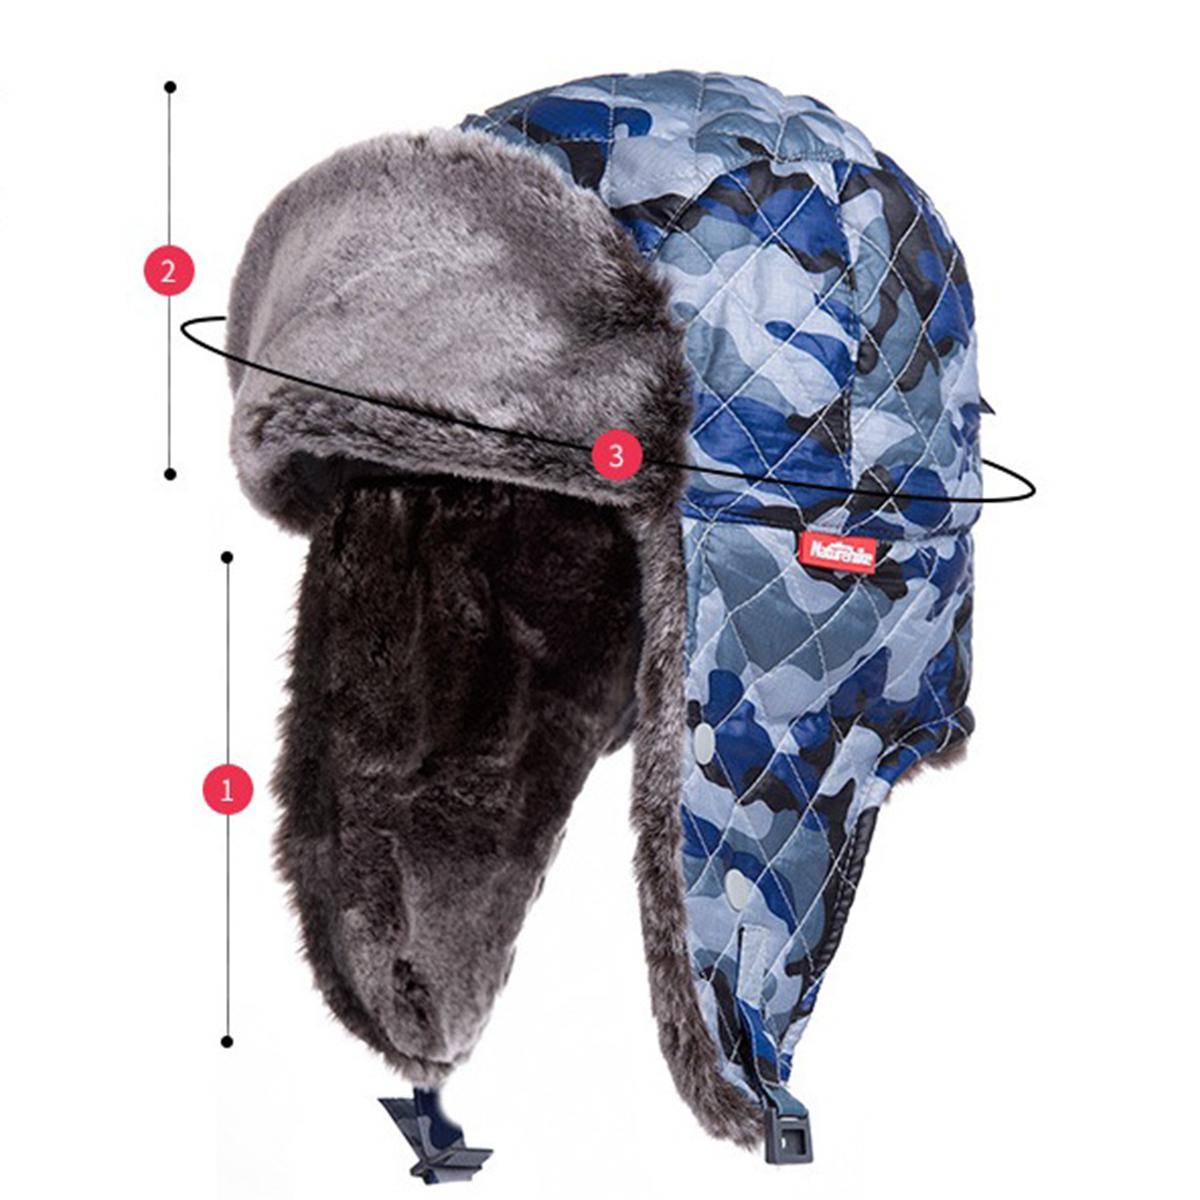 5778d9b4eeb Warm Hiking Hat Winter Outdoor Camping Travel Cap Unisex Aviator Ear Flap  Hats